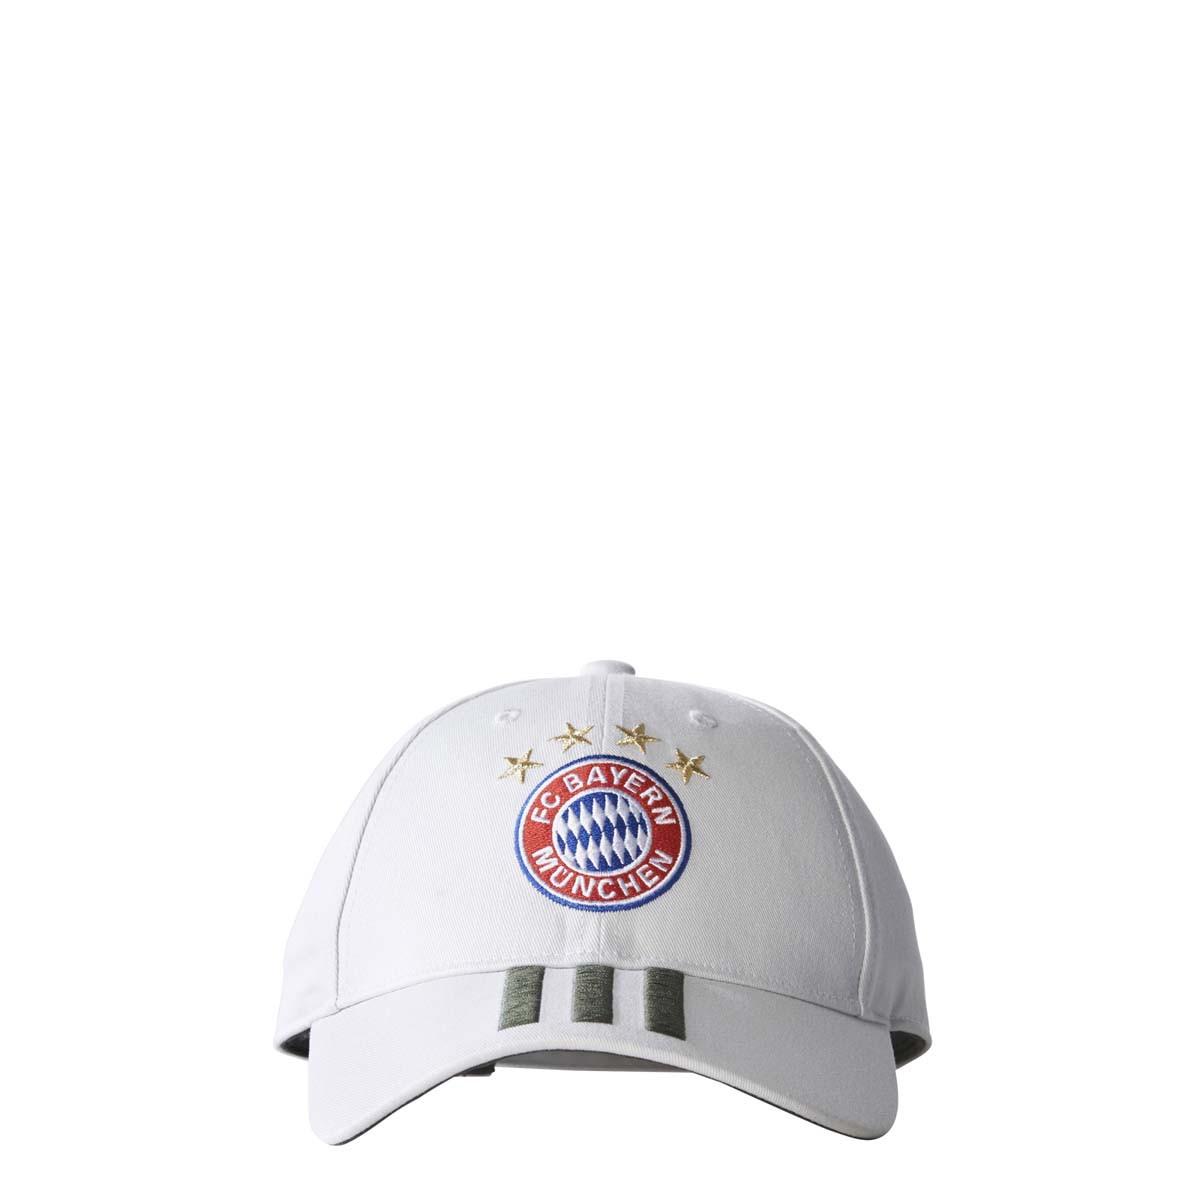 ADIDAS BAYERN CASQUETTE BLANC 20172018 Bayern Munich